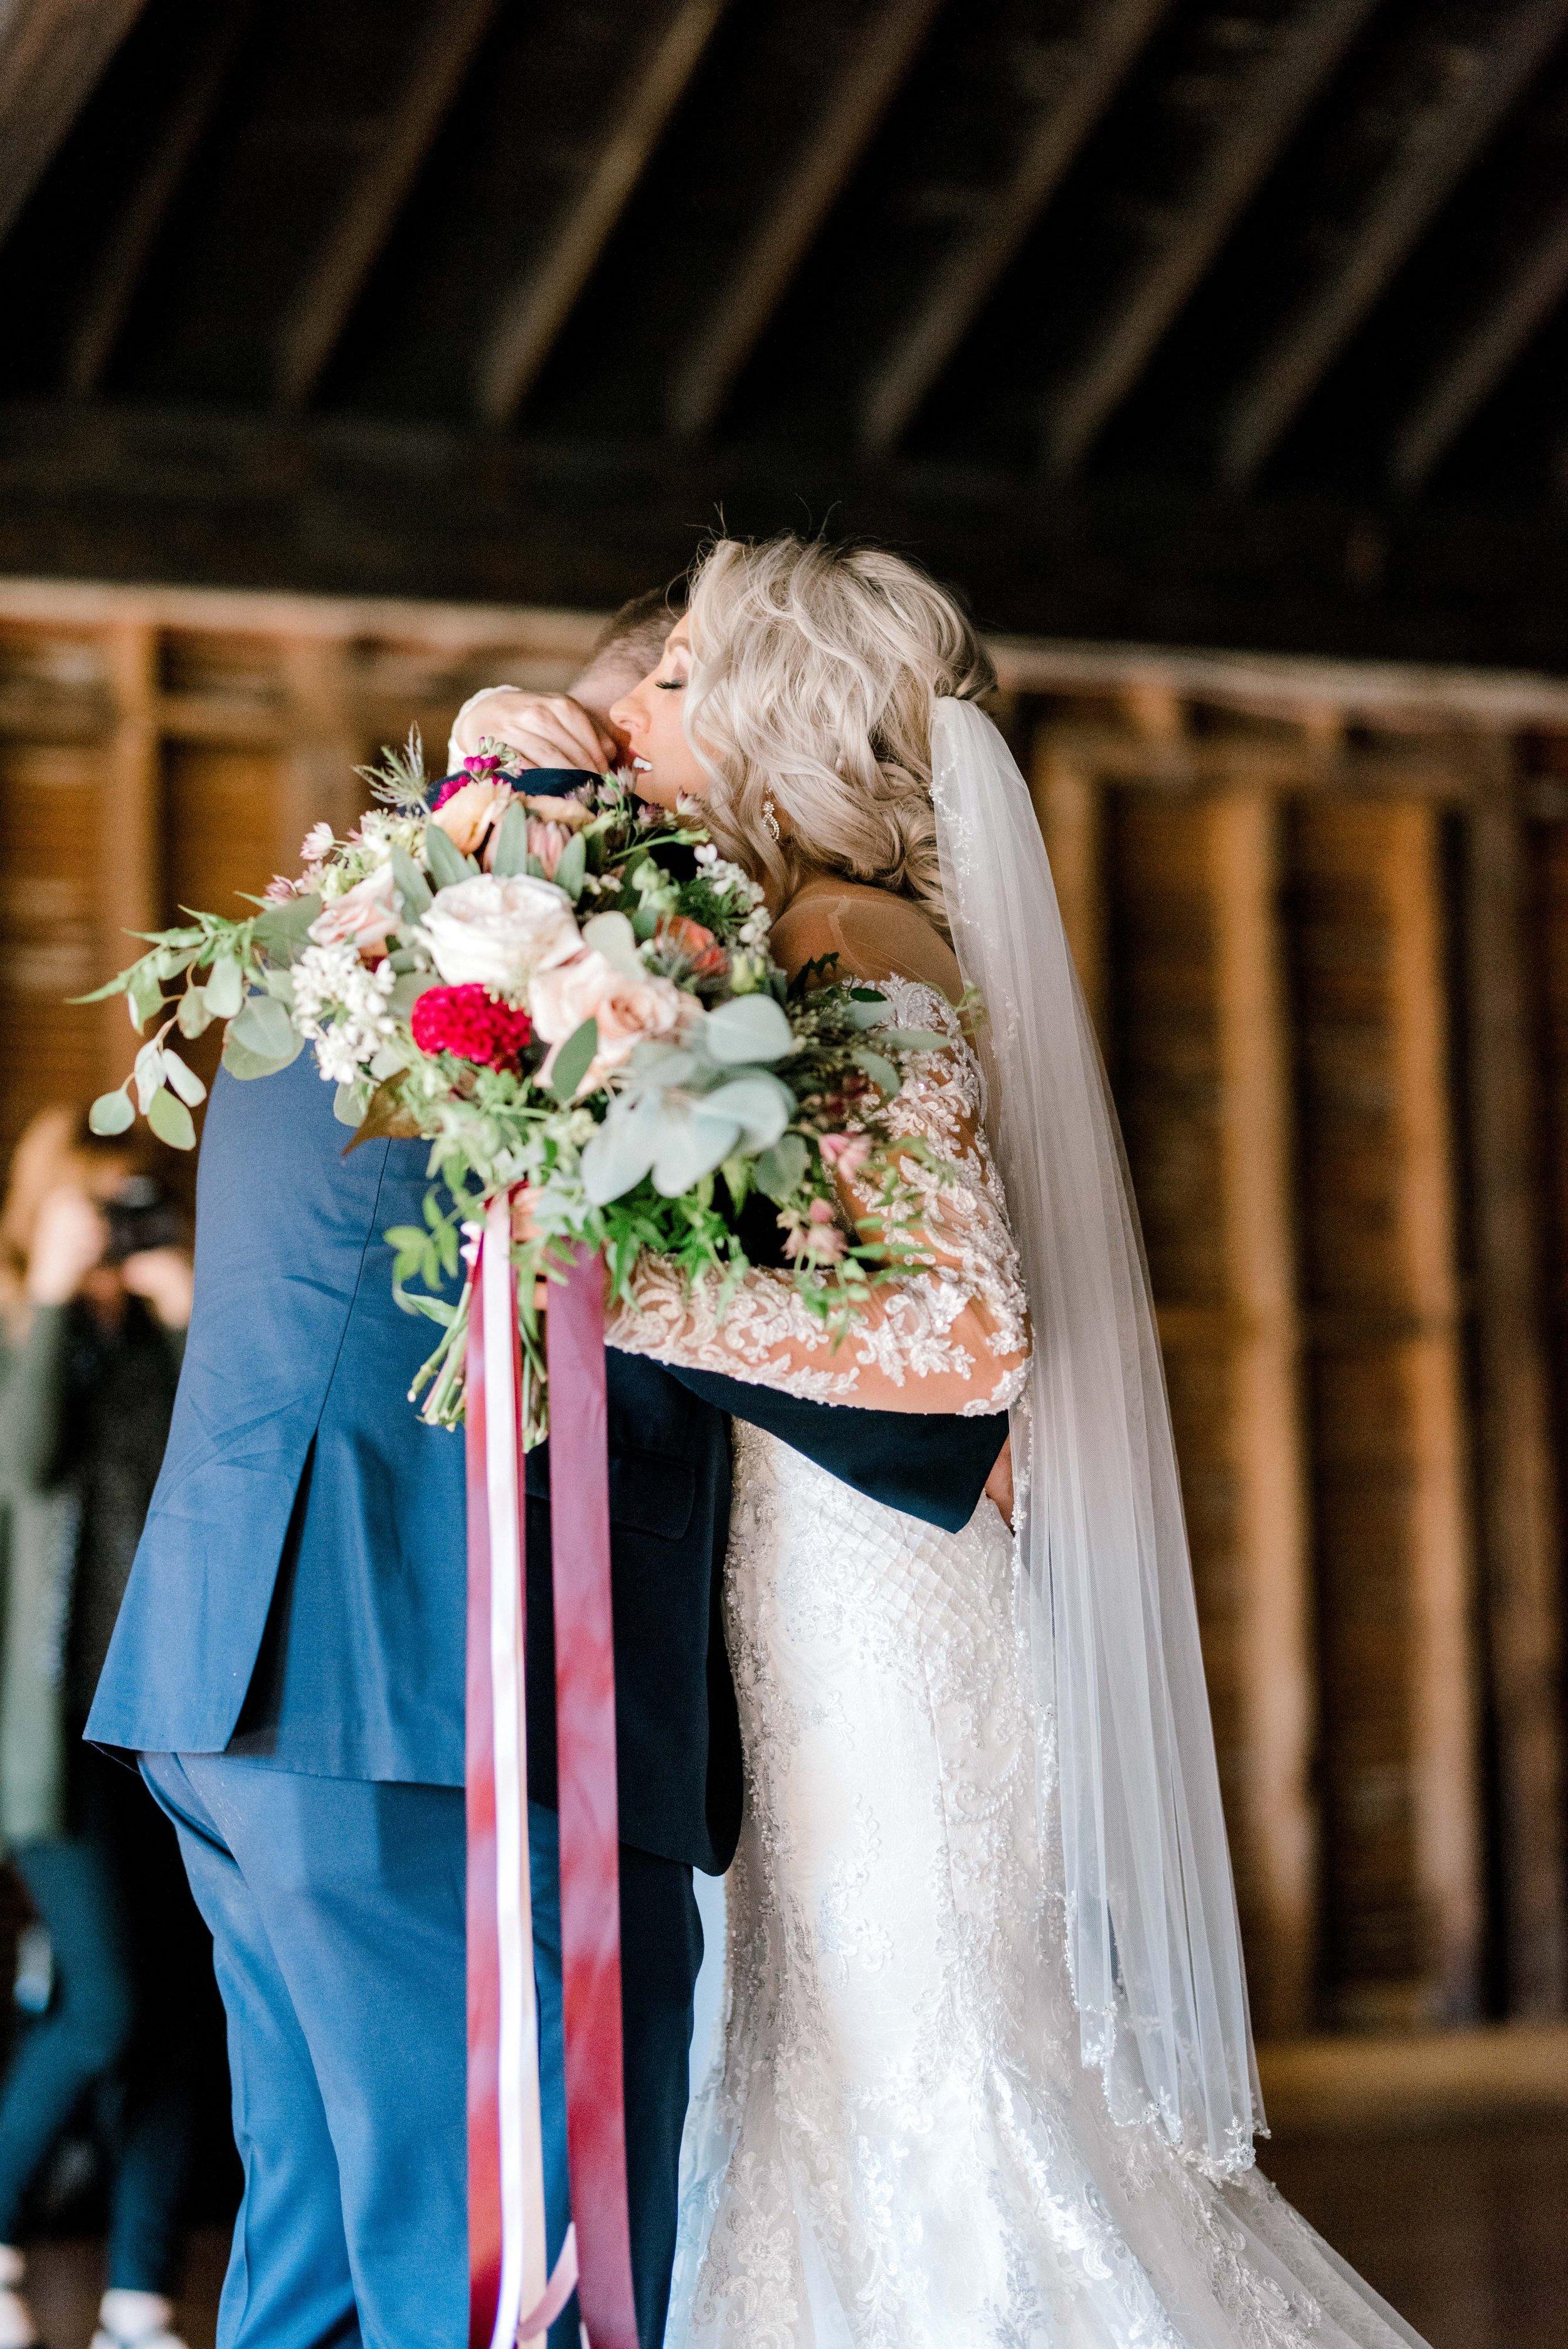 Ryan Alexa Married-Getting Ready First Look-0213.jpg